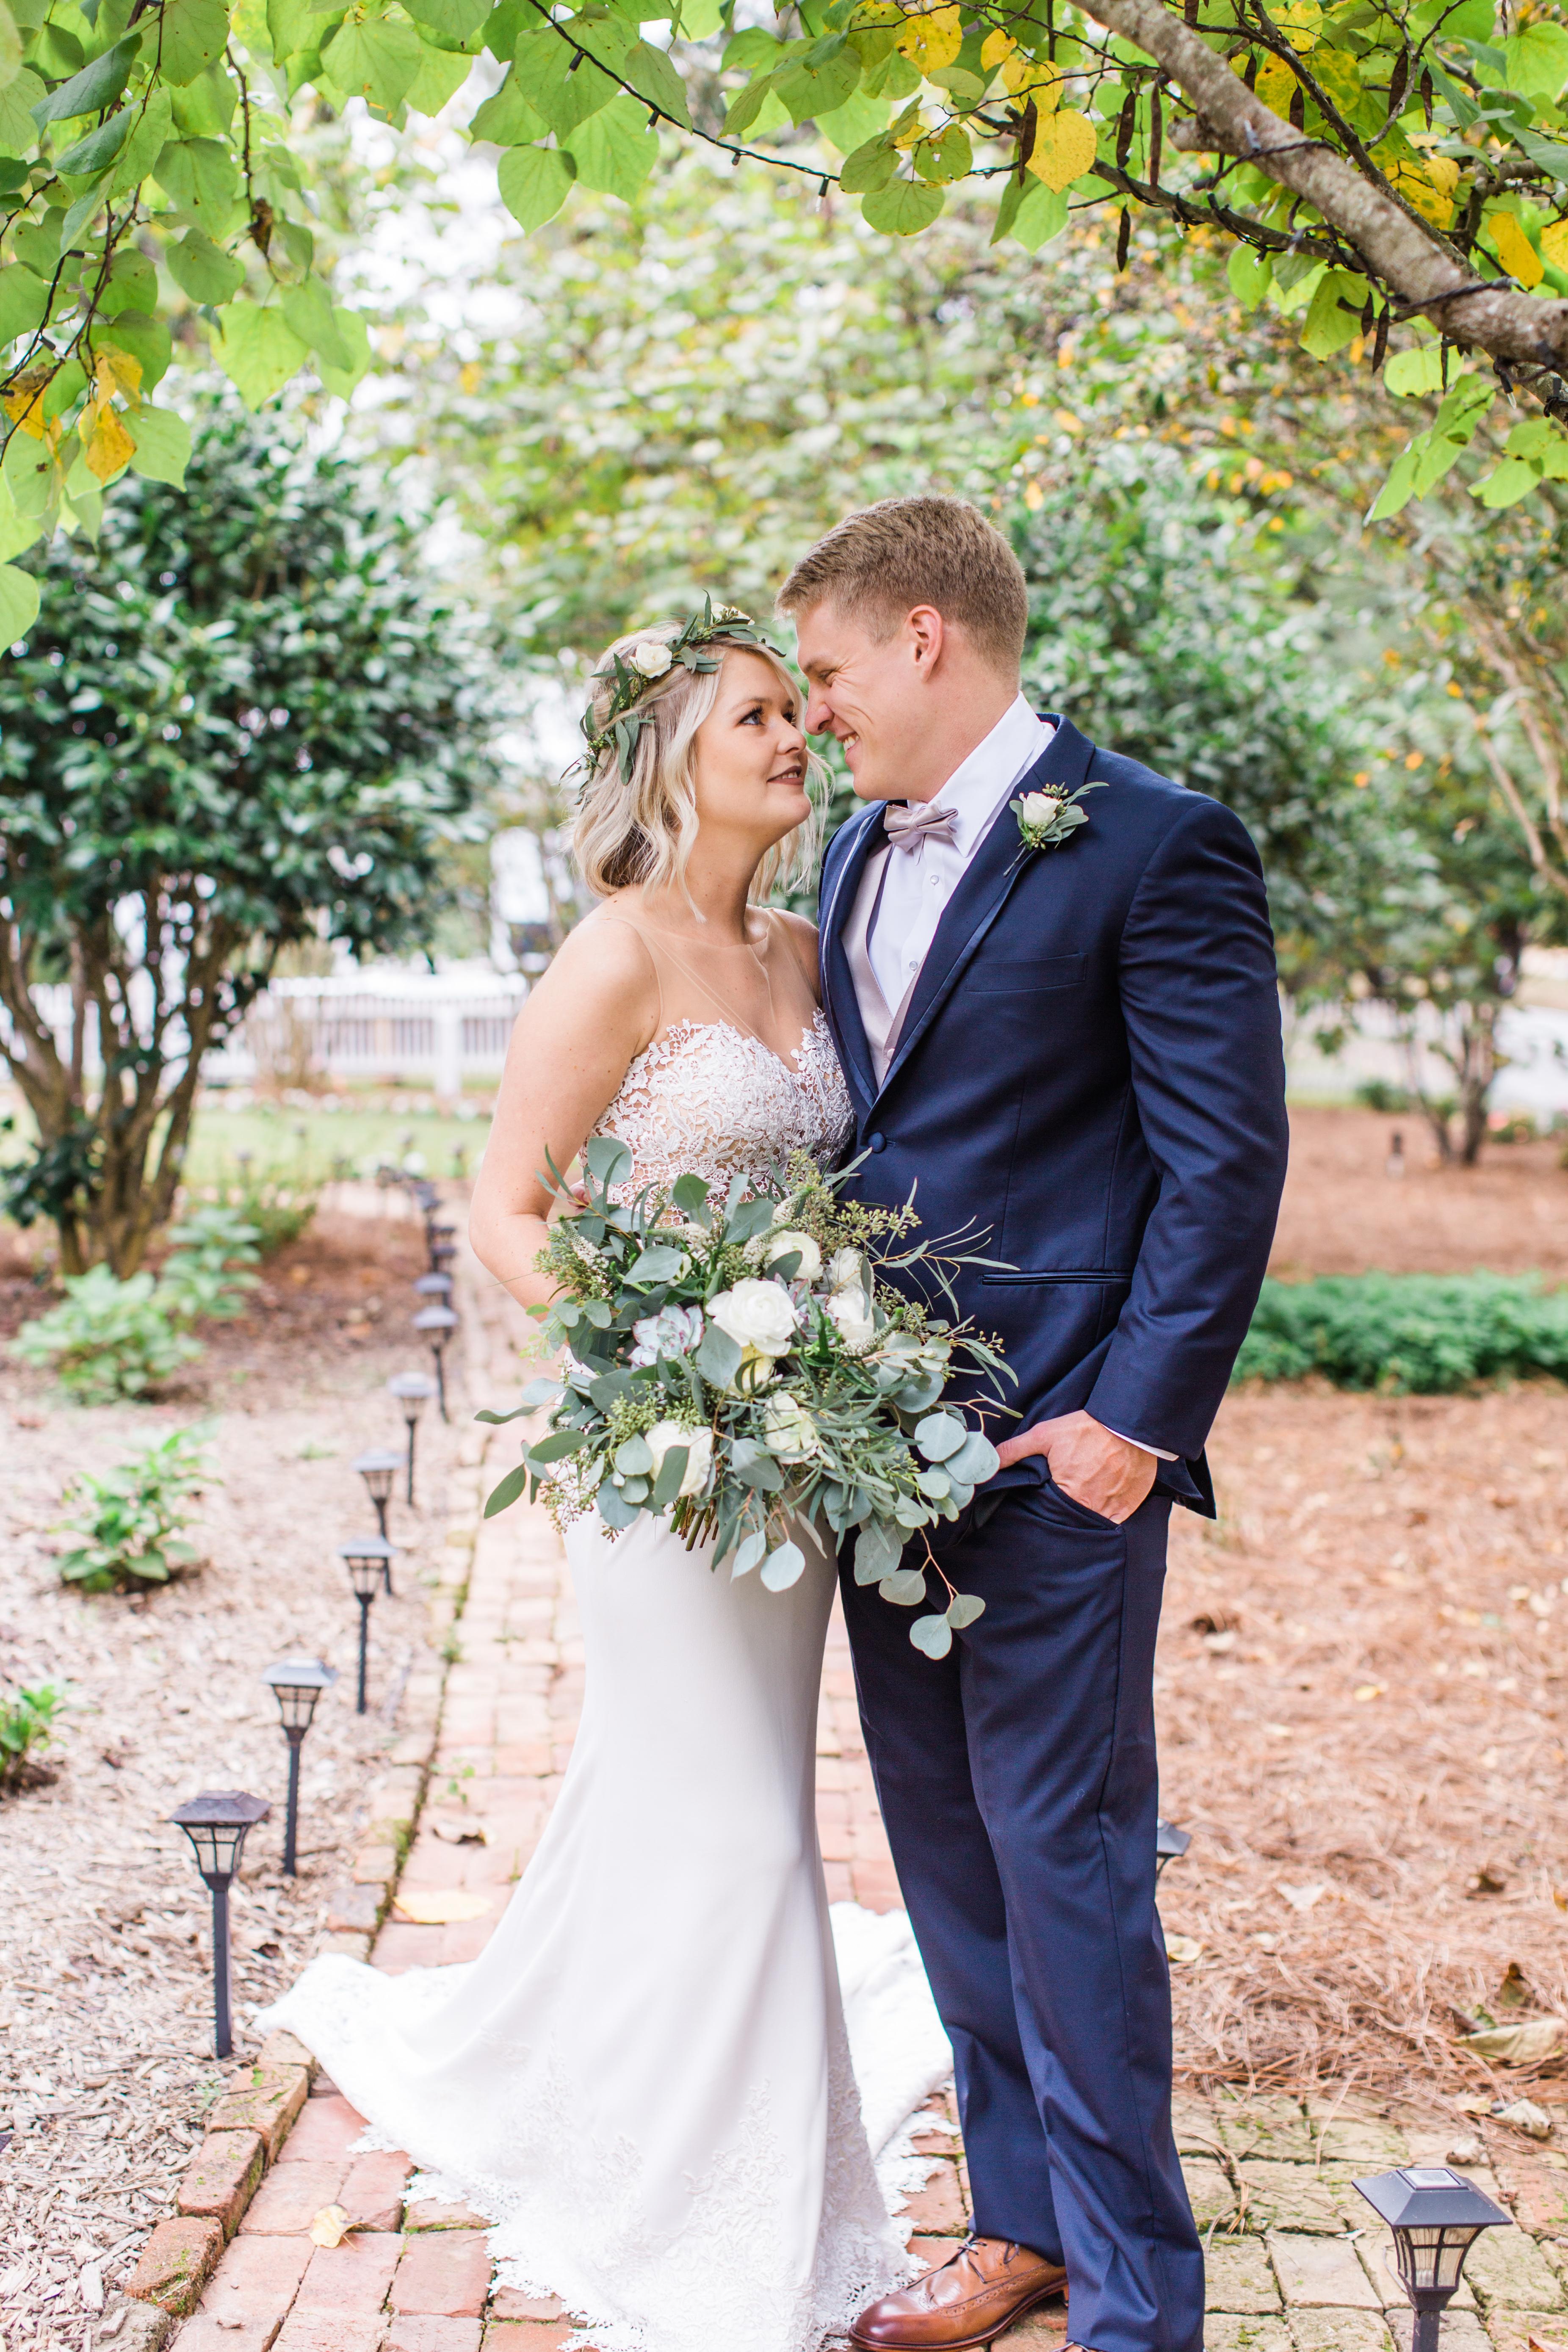 Asterisk Photo_Volkmer Wedding-21